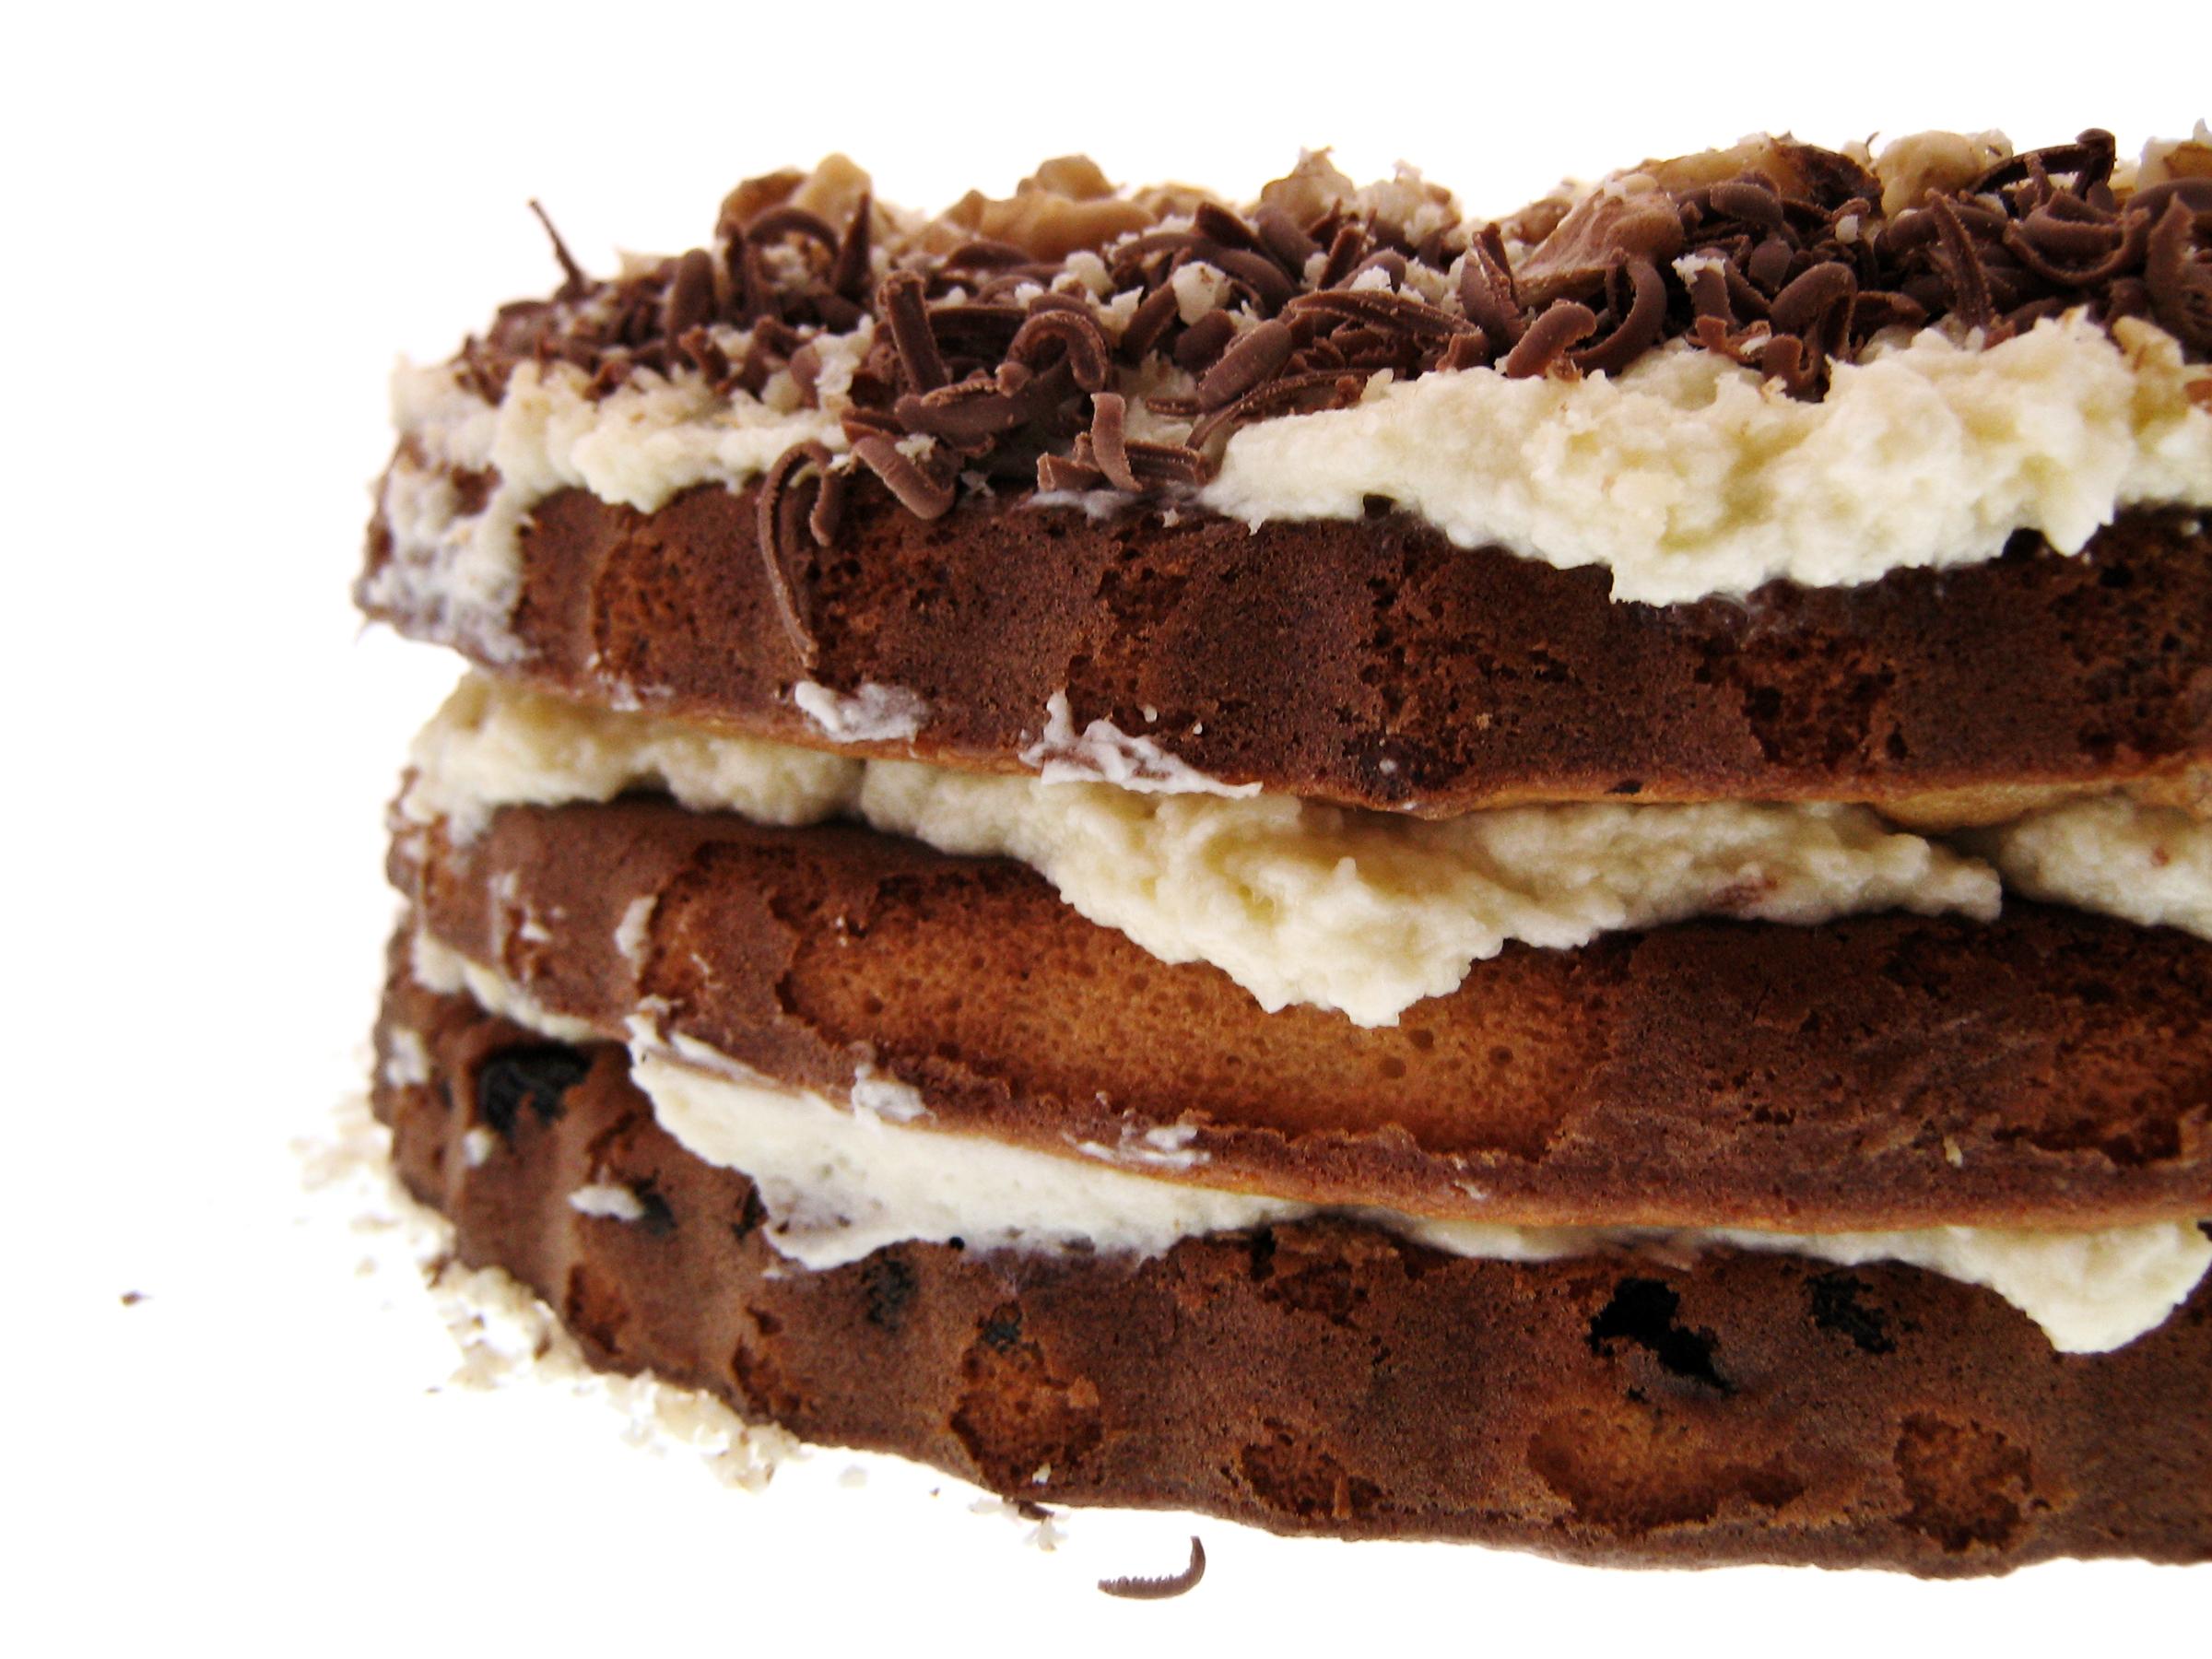 Cake photo